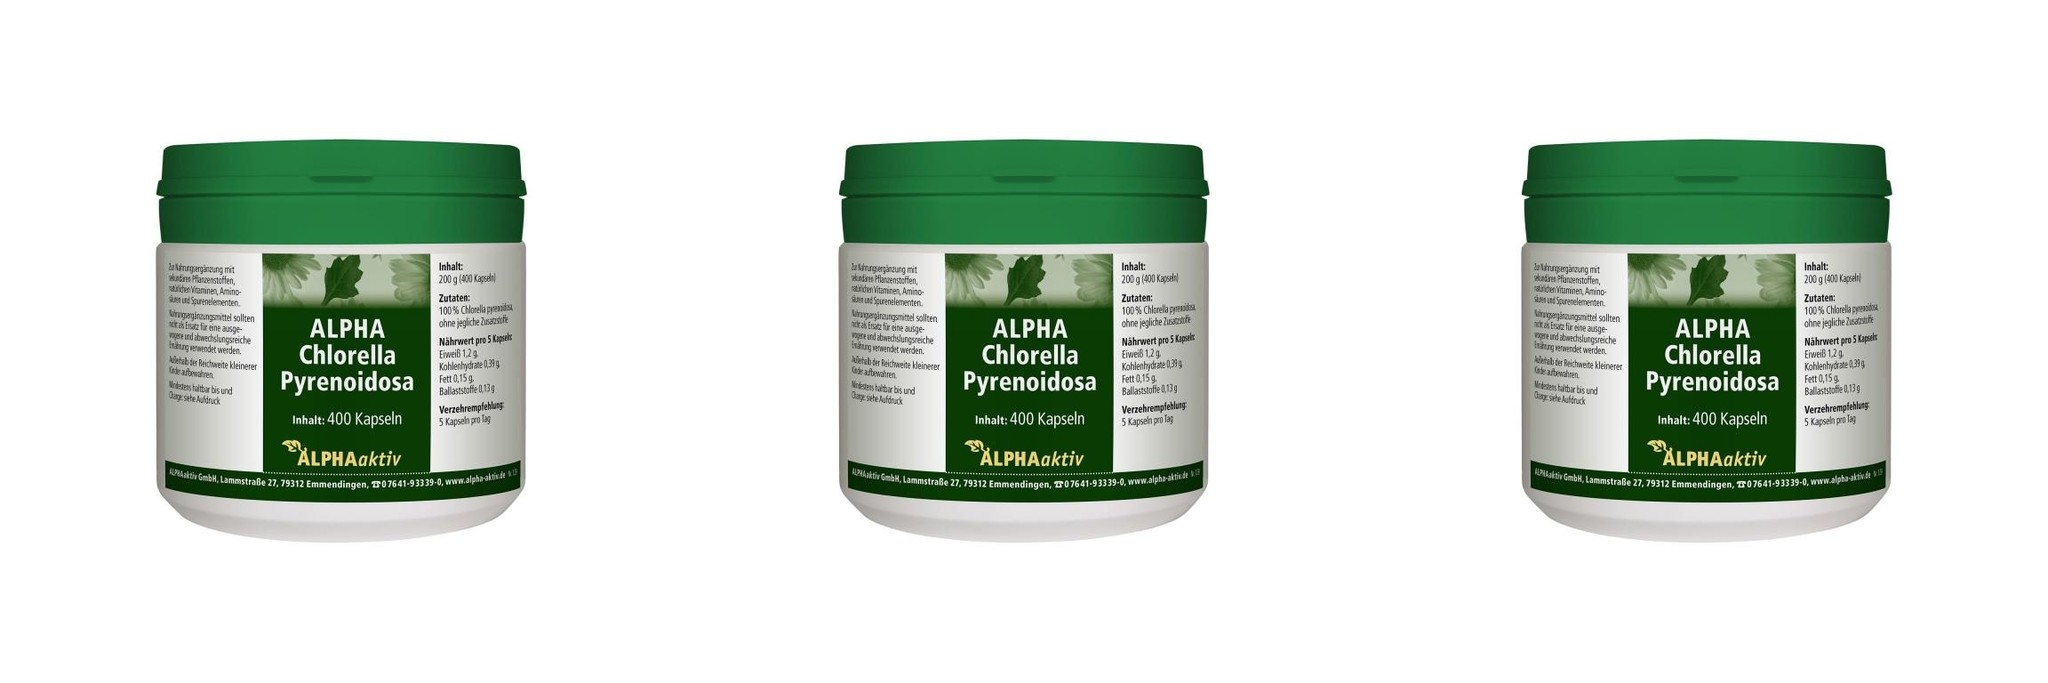 ALPHAaktiv ALPHA-Chlorella Pyrenoidosa, 400 Kapseln, 200 g., 3-packs